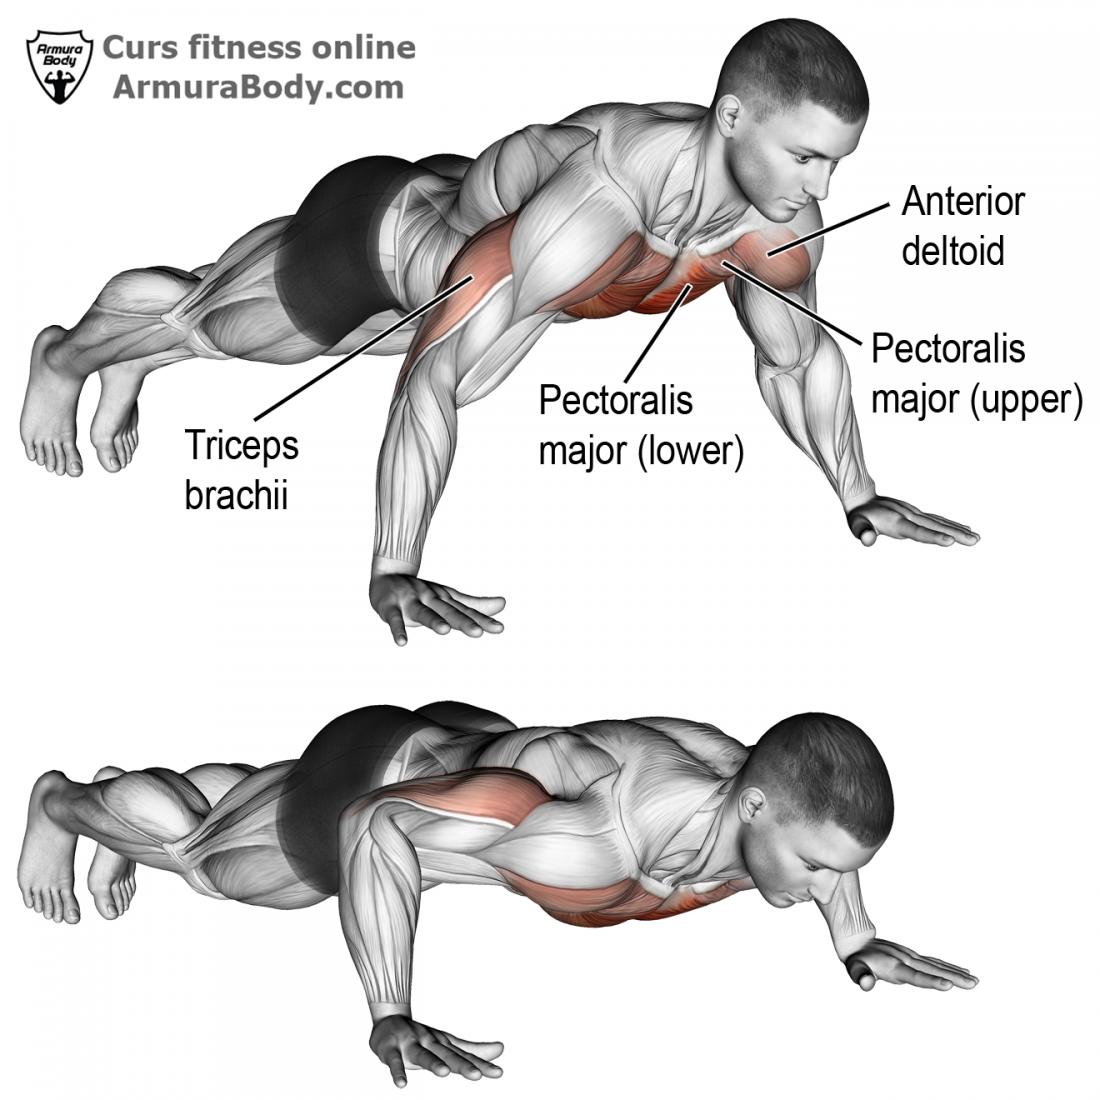 curs fitness instructor antrenor personal trainer antrenez corect piept pectorali exercitii pectorali exercitii piept